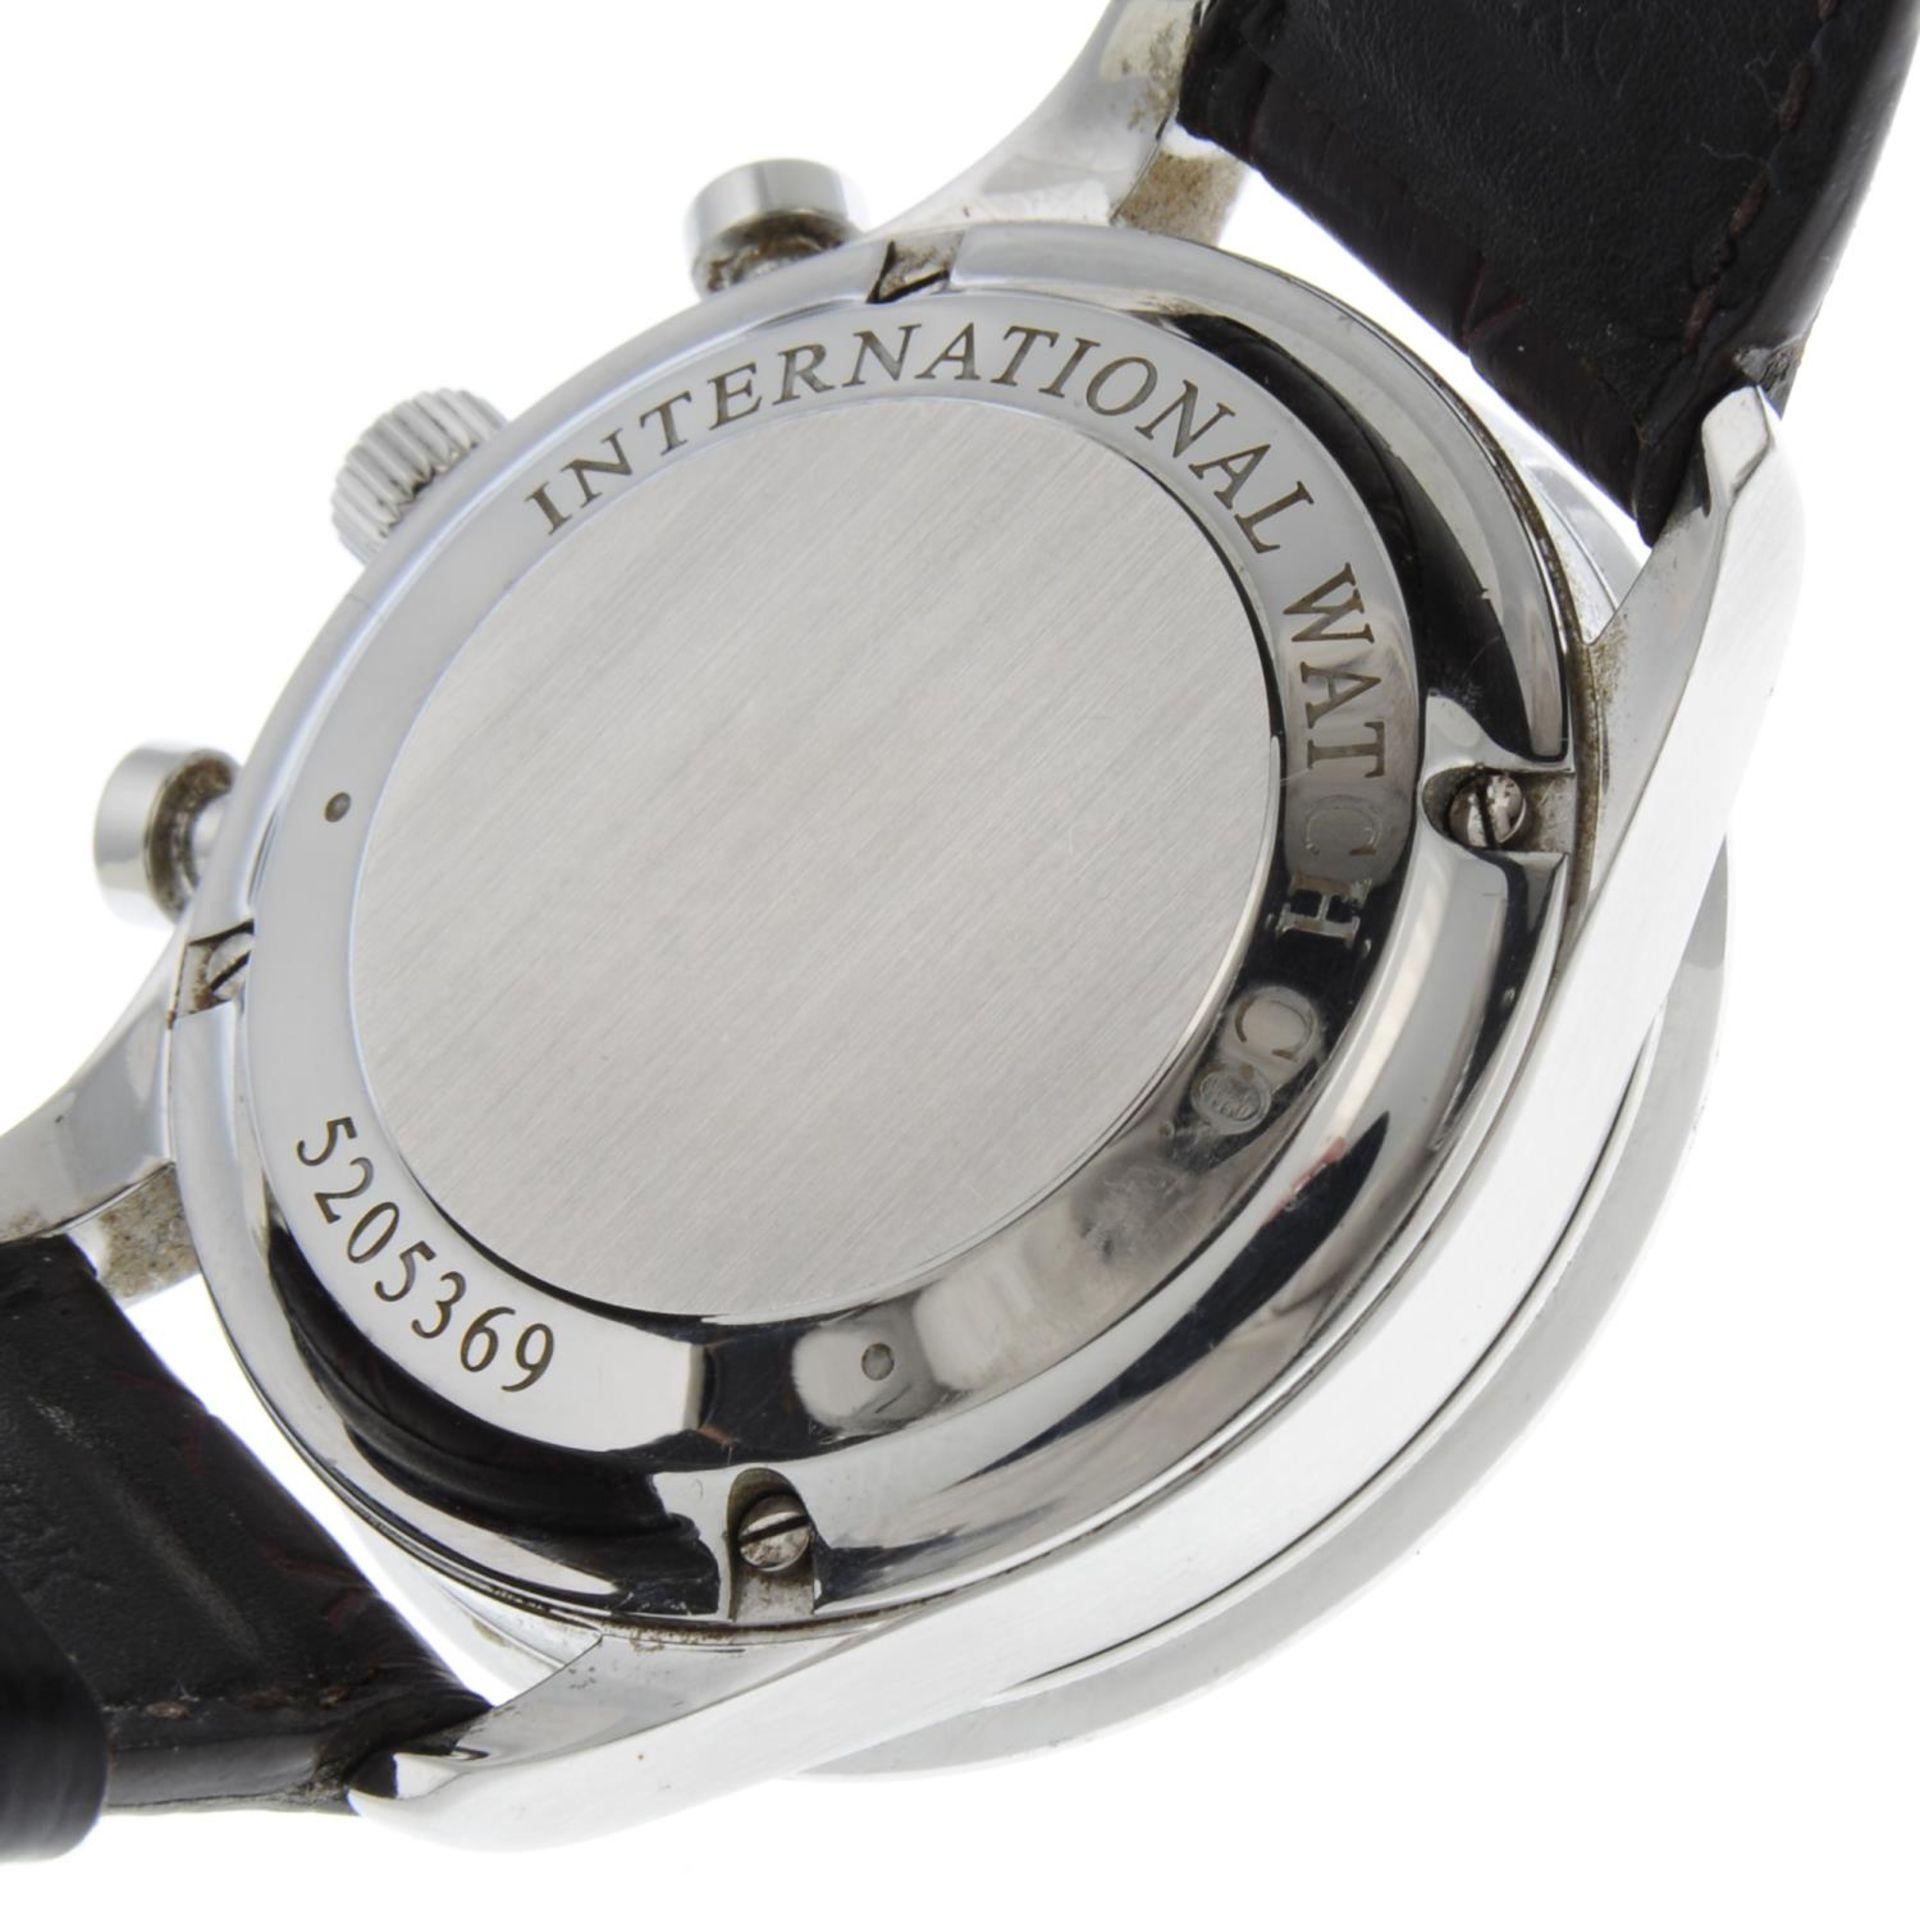 IWC - a Portuguese chronograph wrist watch. - Bild 6 aus 6